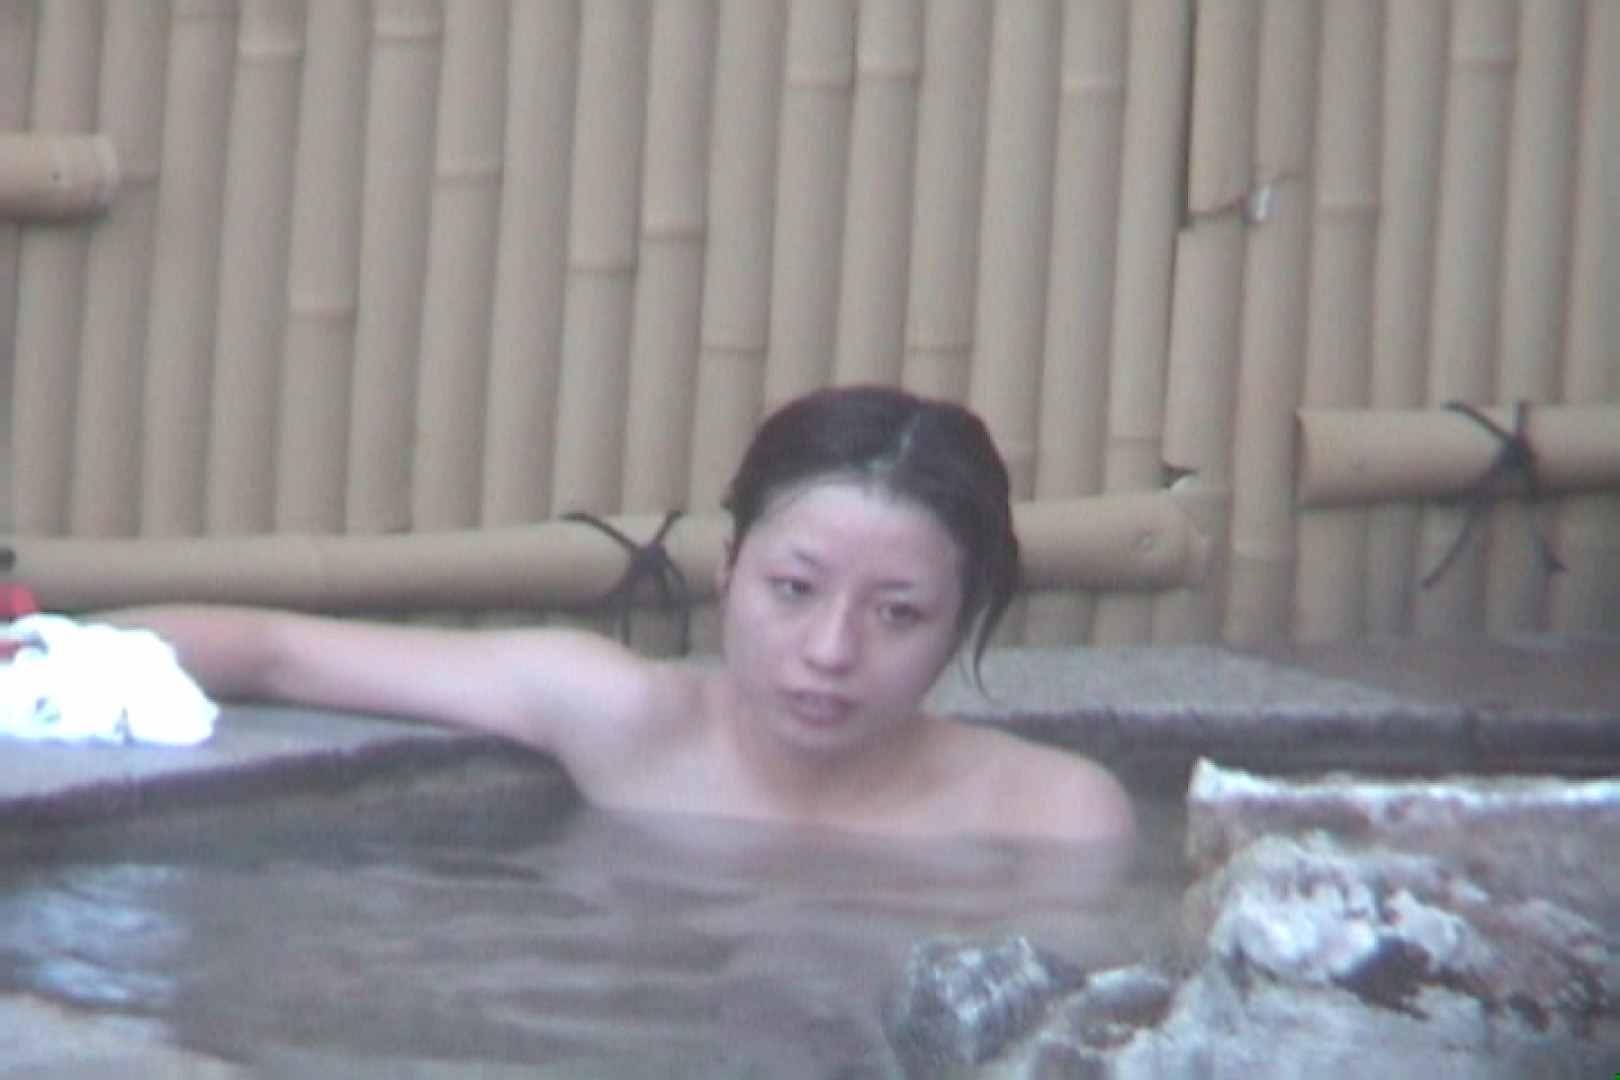 Aquaな露天風呂Vol.608 盗撮 戯れ無修正画像 69連発 35